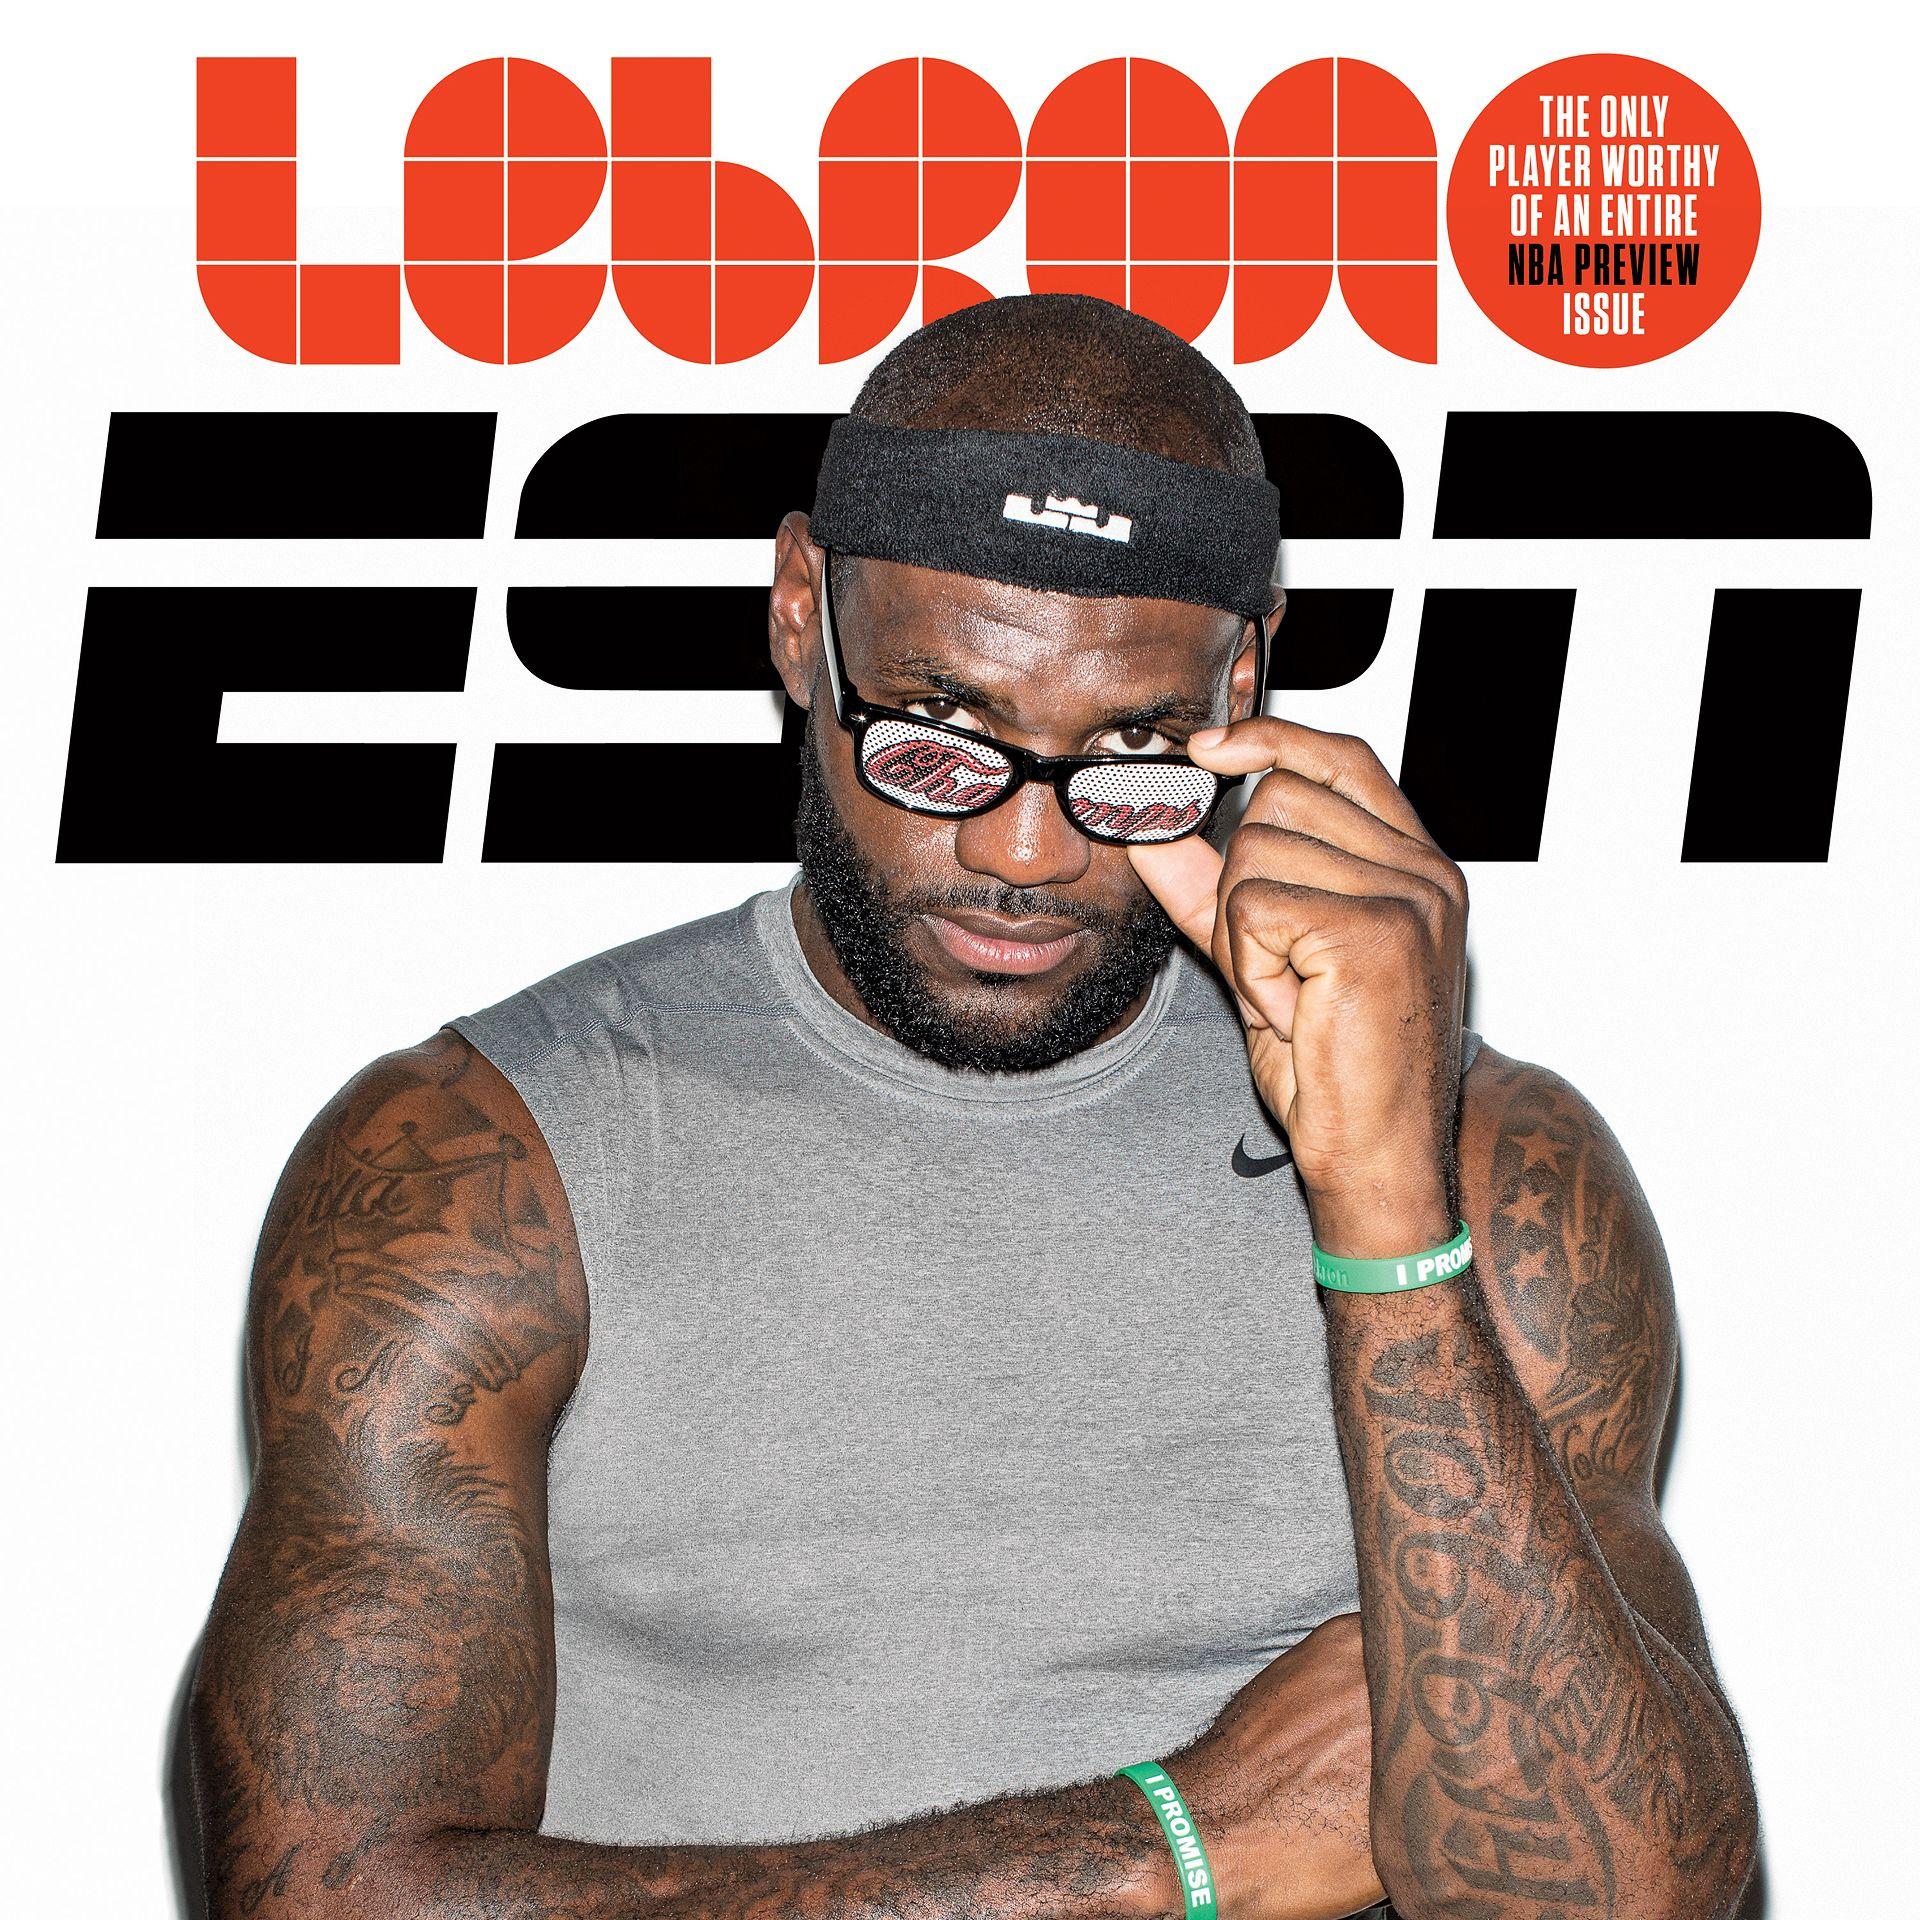 LeBron James' No. 23 Lakers jerseys sold prematurely at NBA Store